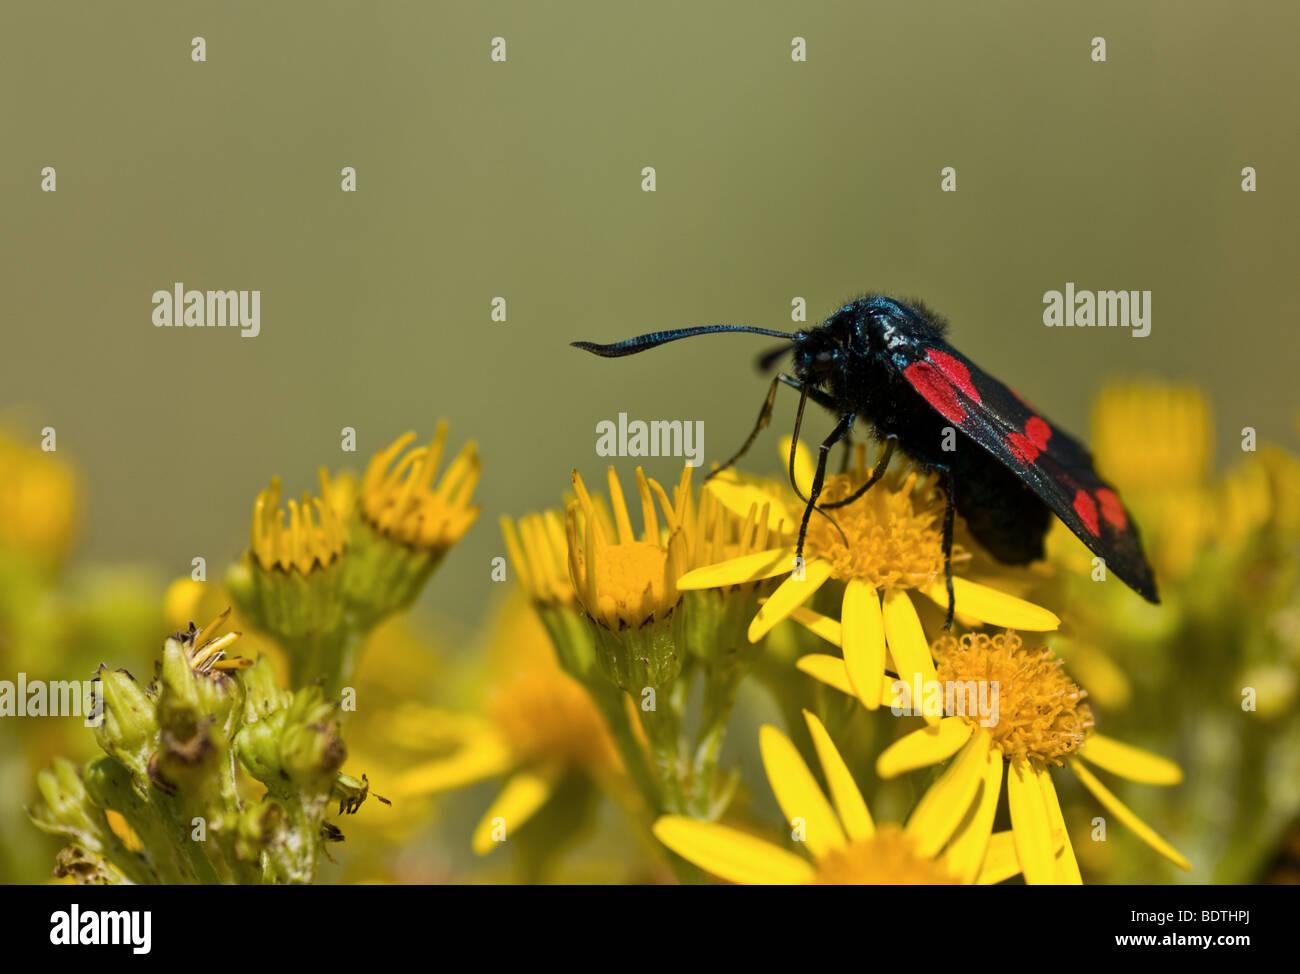 Sechs-Spot Burnet Motten (Zygaena Filipendulae) auf Kreuzkraut (Senecio Jacobaea) Stockfoto